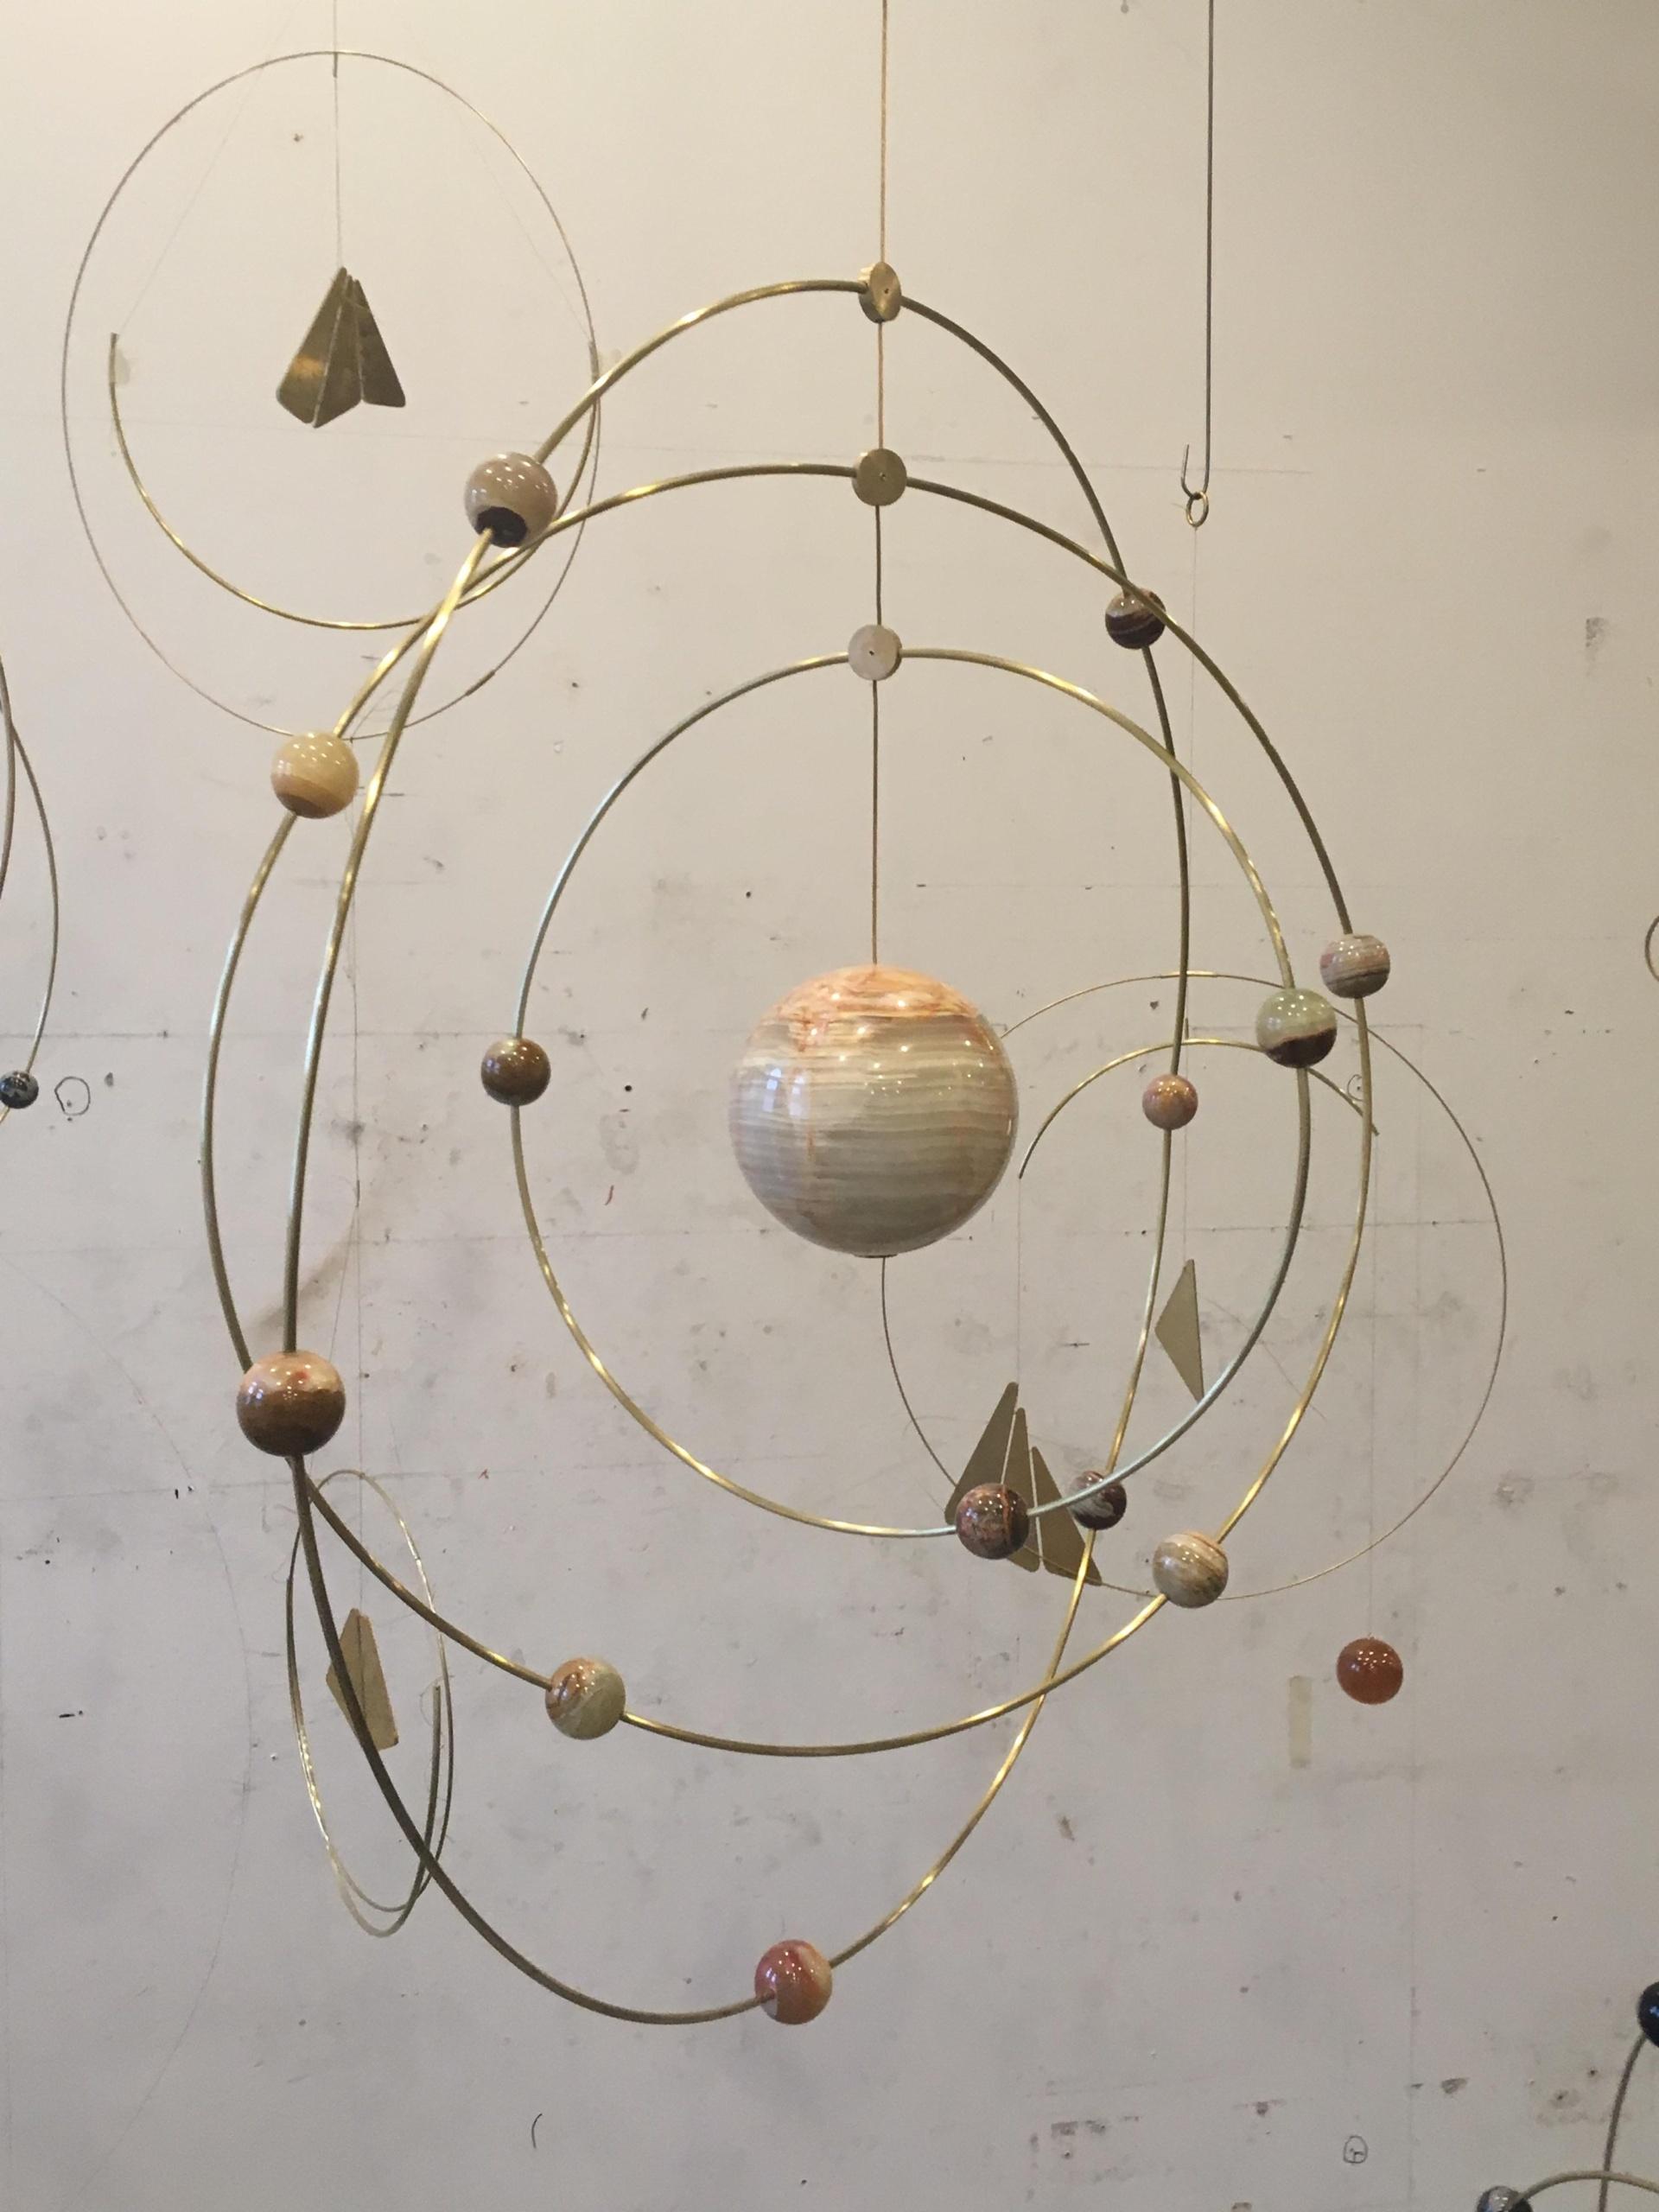 Kaja Skytte: Malerisk Marmor – brudstykker og nye sammensætninger